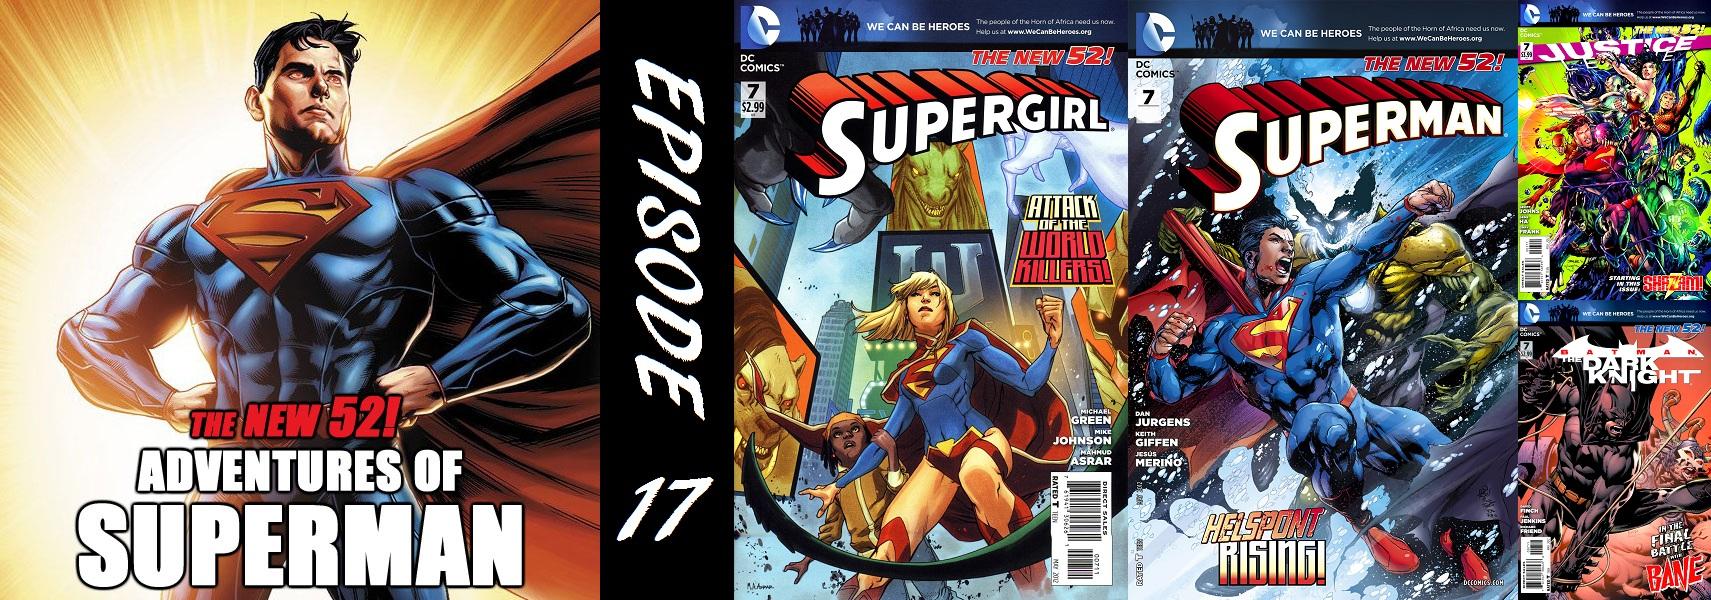 17 Supergirl Superman 7